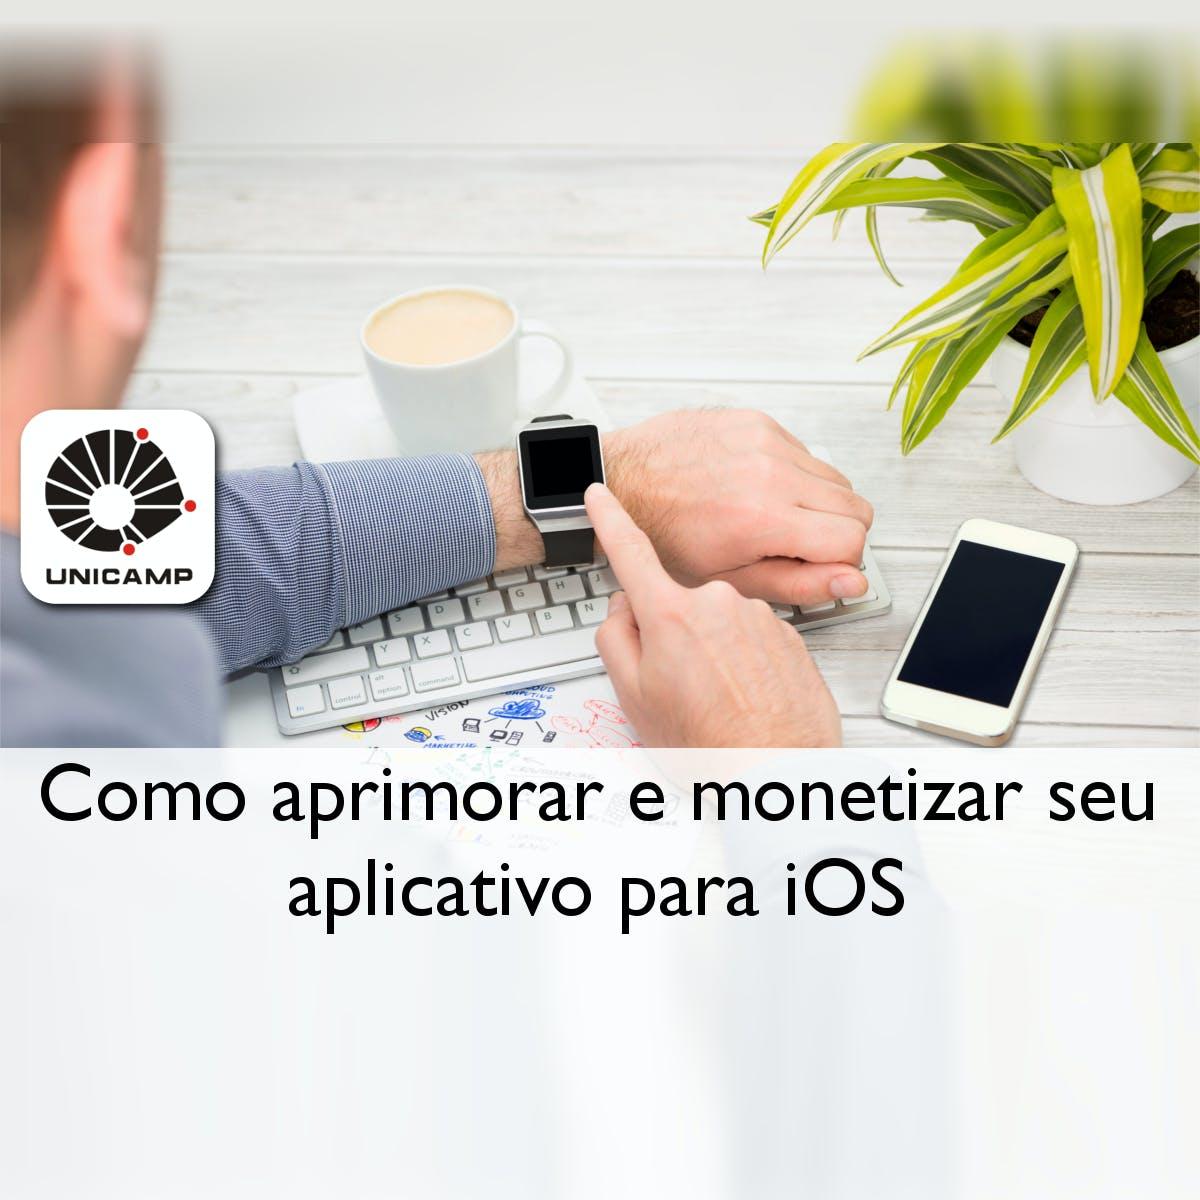 Como aprimorar e monetizar seu aplicativo para iOS e Apple Watch